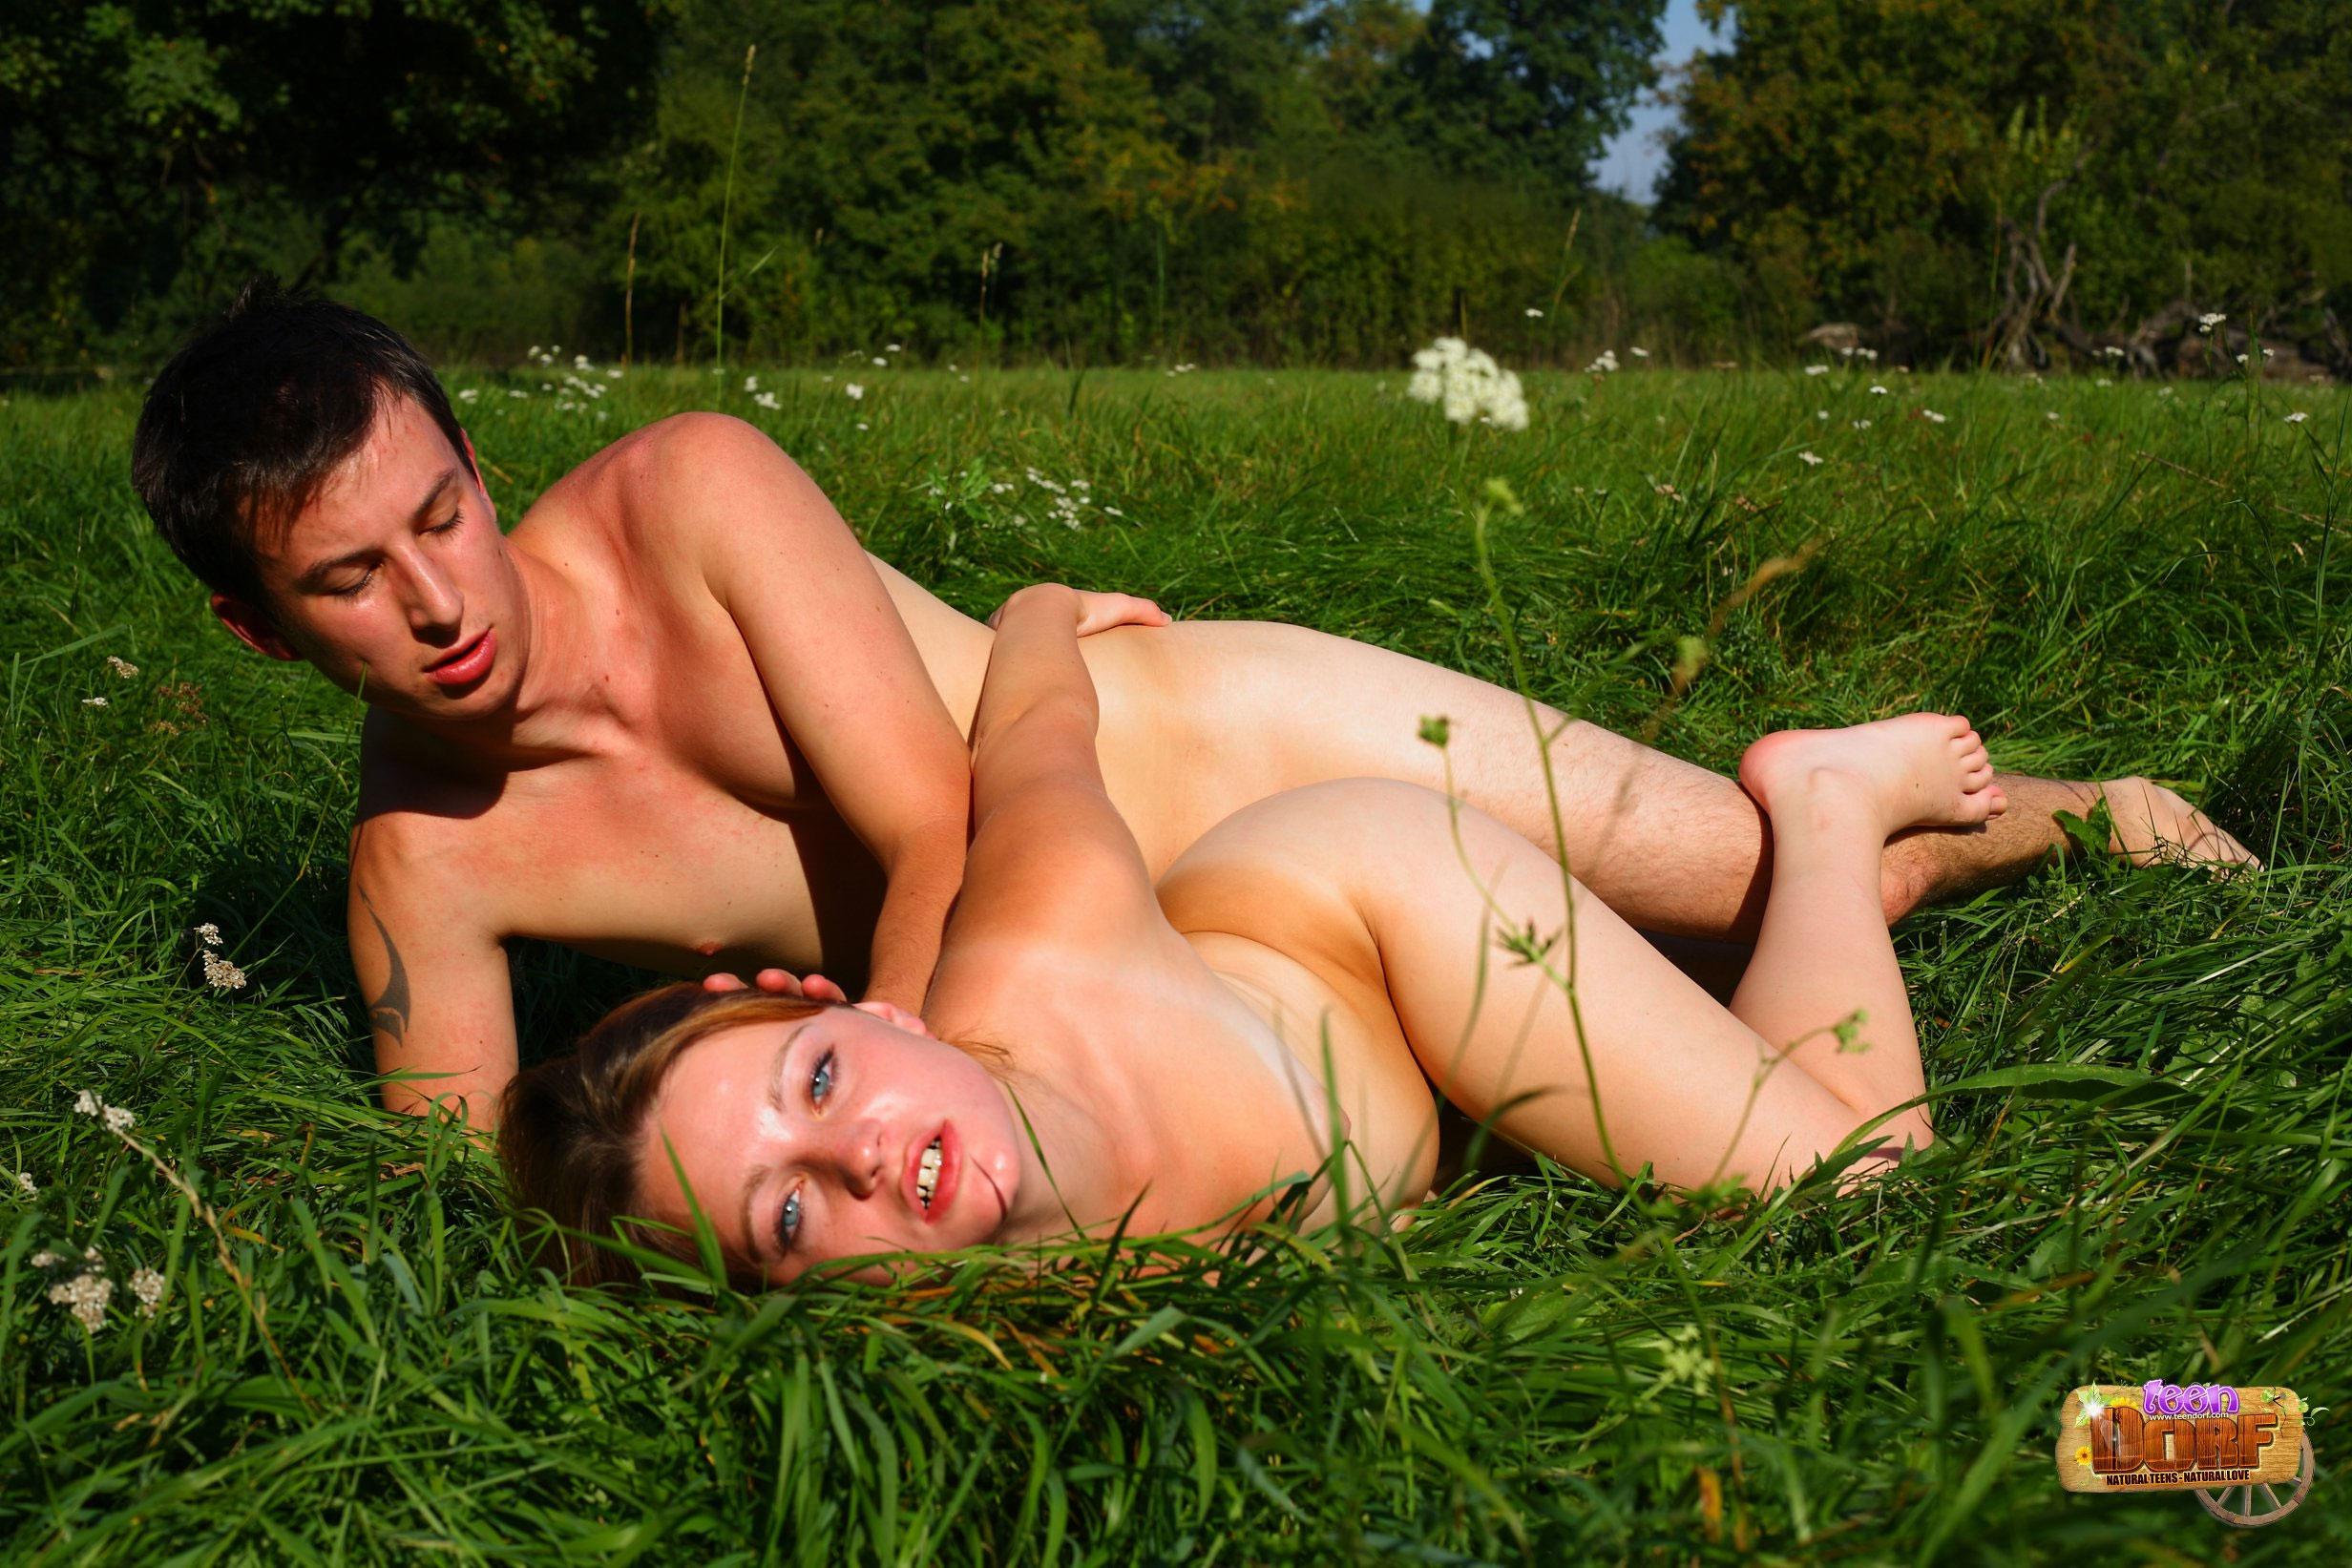 Saggy busty outdoor porn